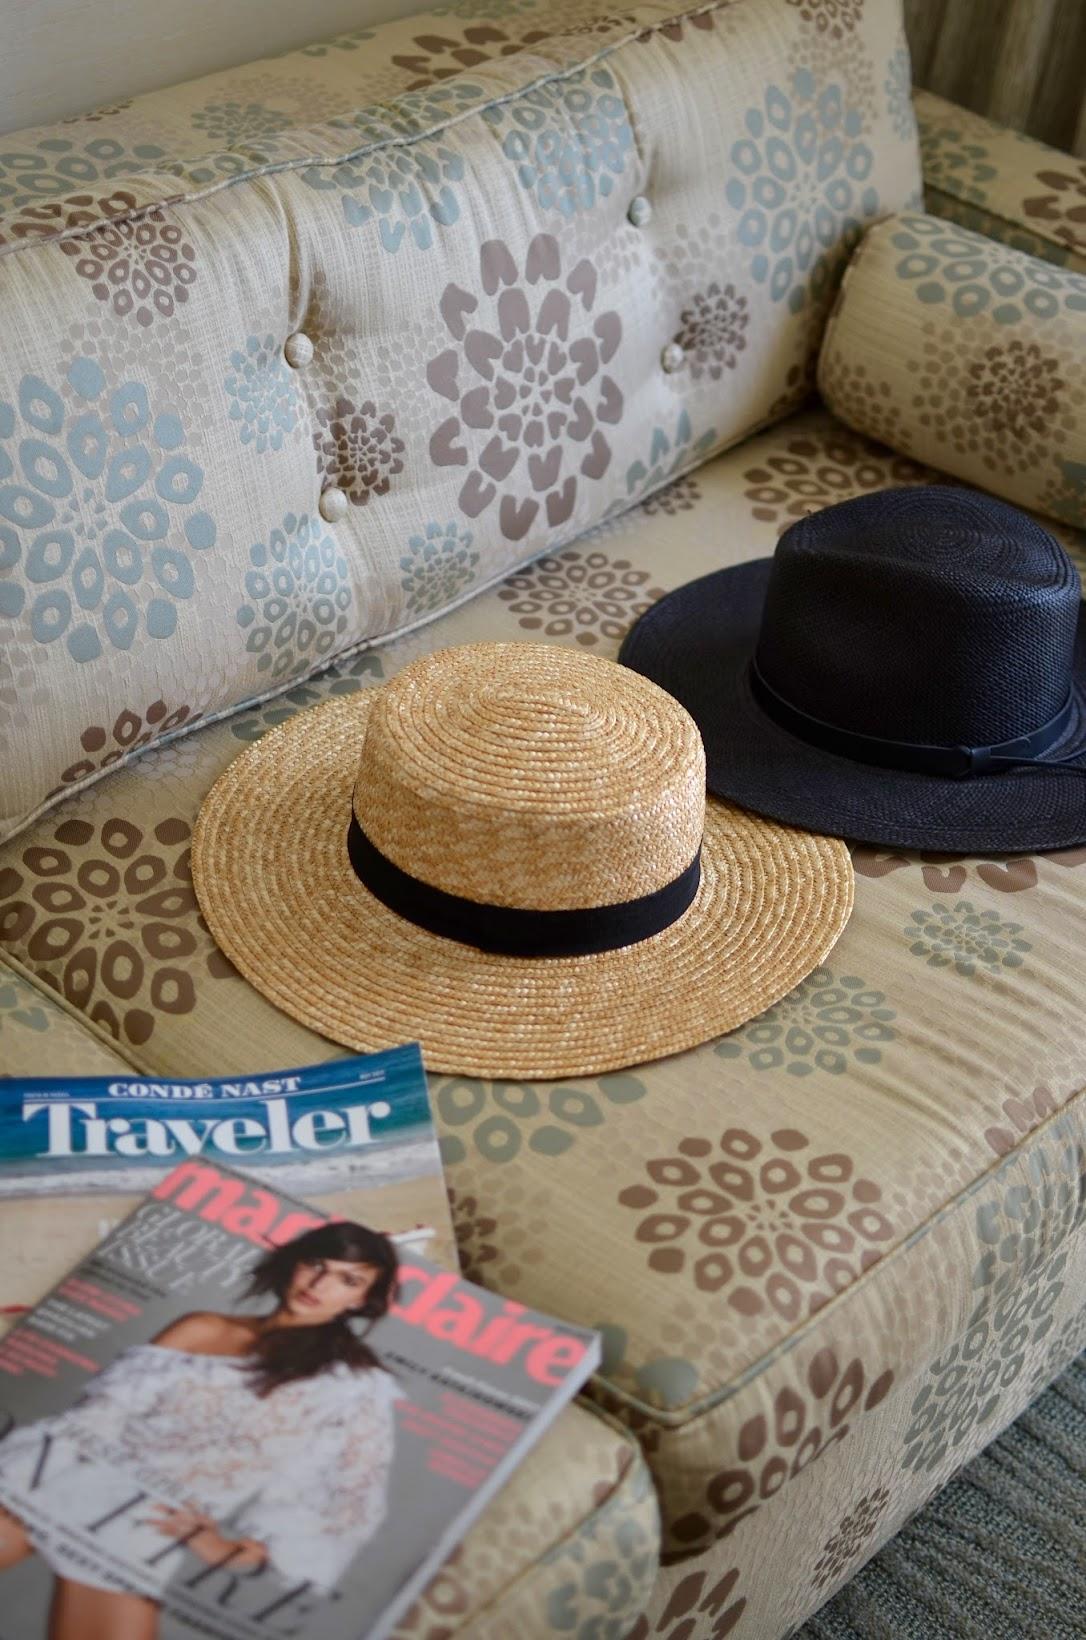 where to stay when in waikiki, shoreline hotel in waikiki, stone cold fox dress, stone cold fox, chic beach wear, cute boater straw hat